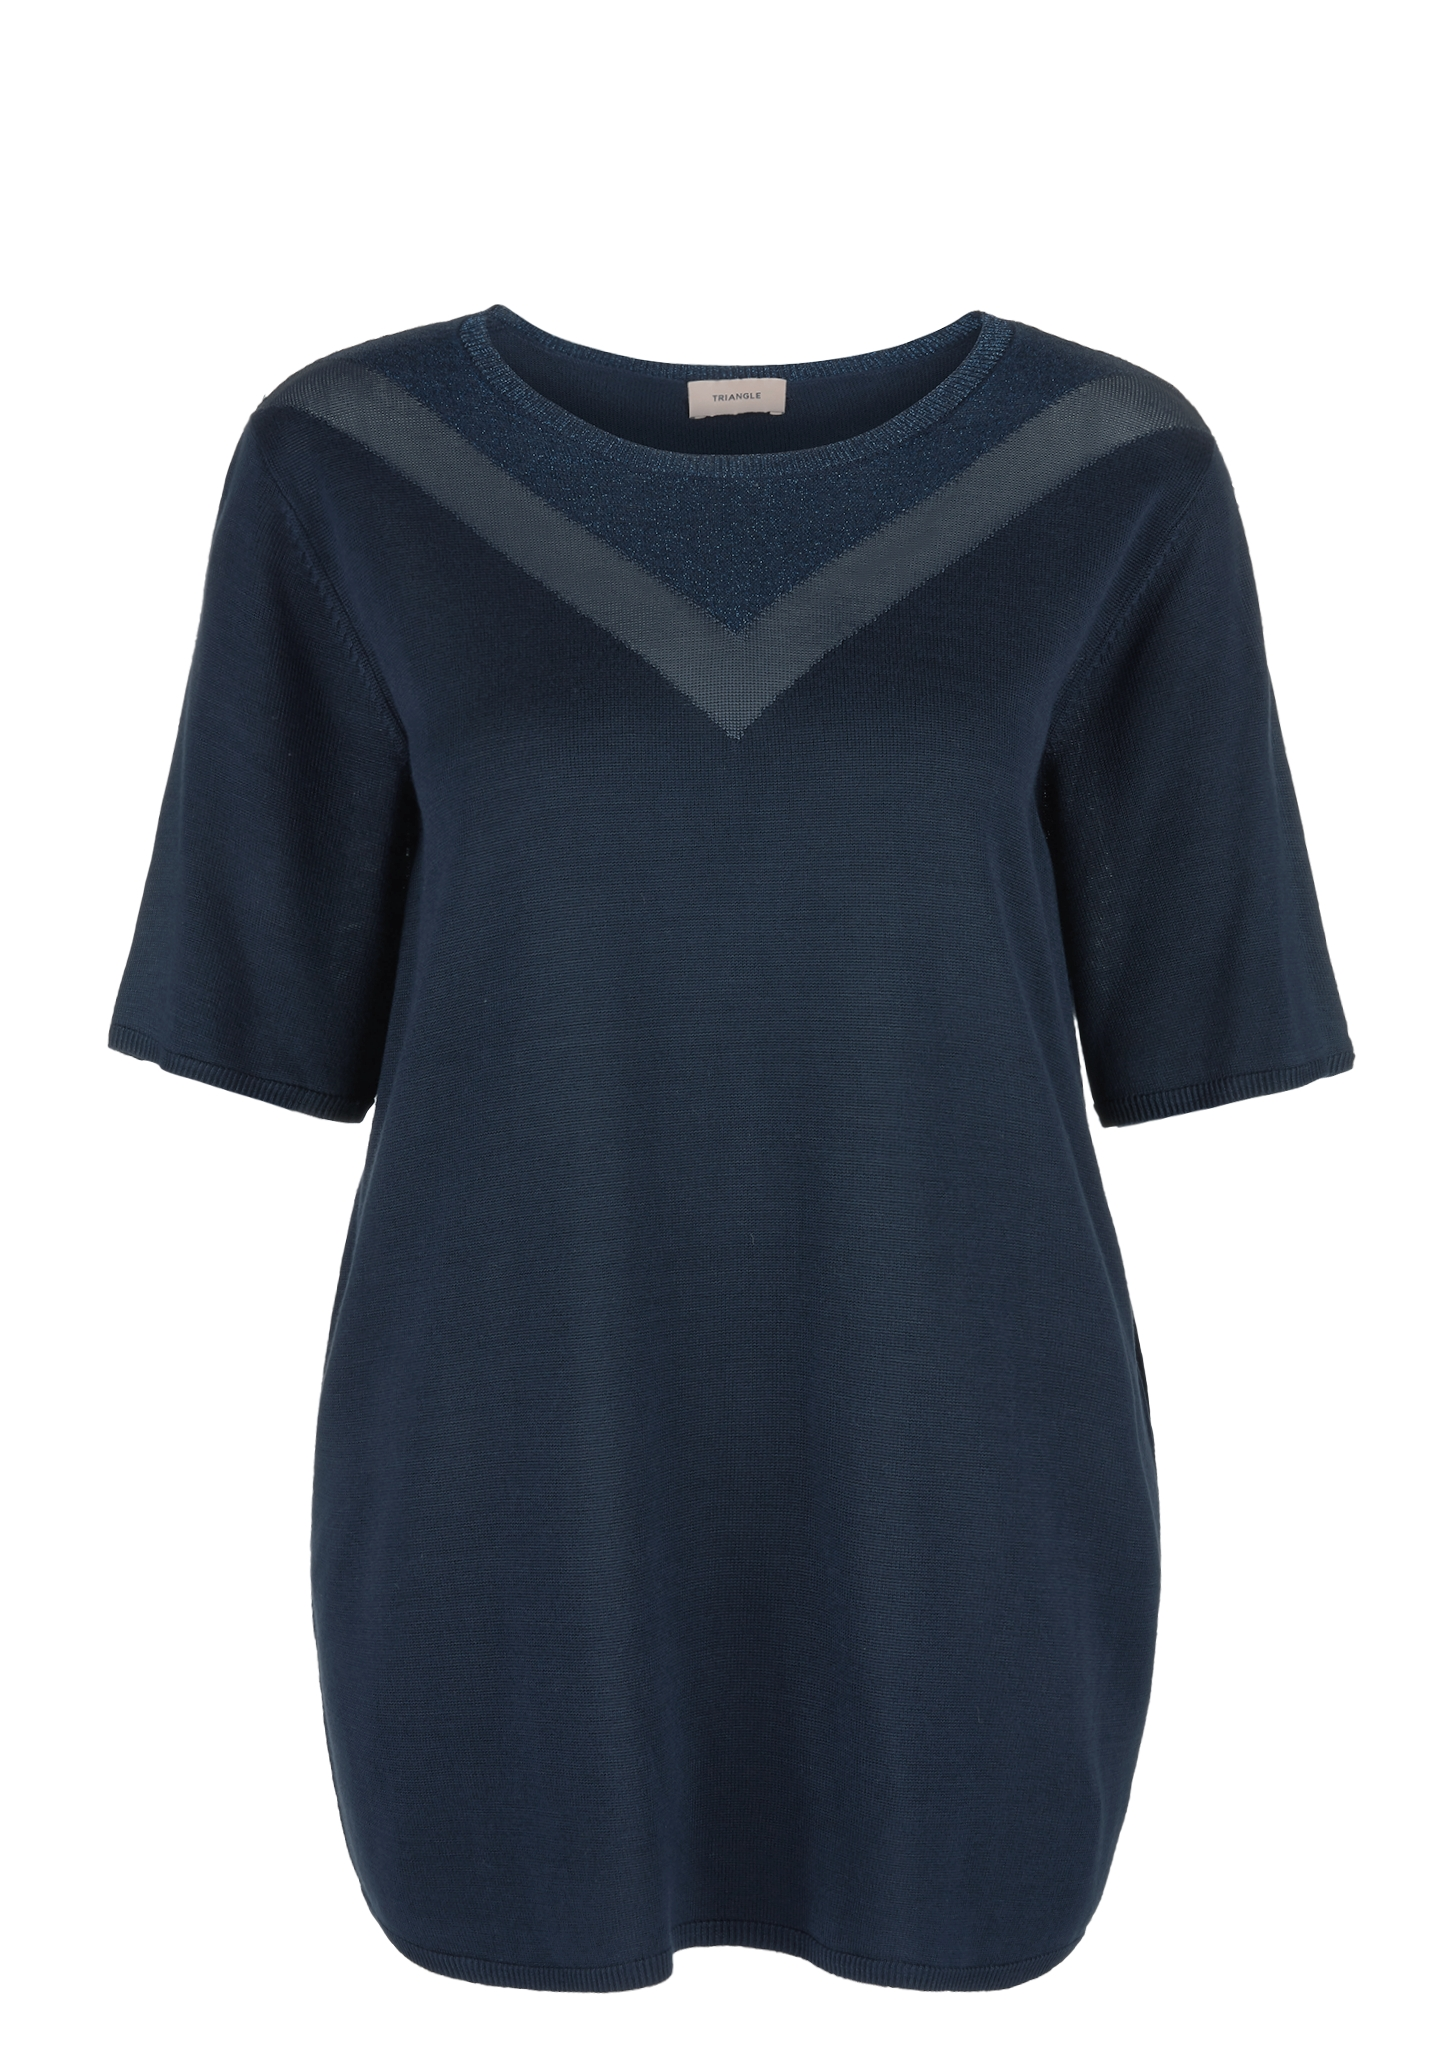 Kurzarmpullover   Bekleidung > Pullover > Kurzarmpullover   Blau   99% viskose -  1% metallisiertes garn   TRIANGLE